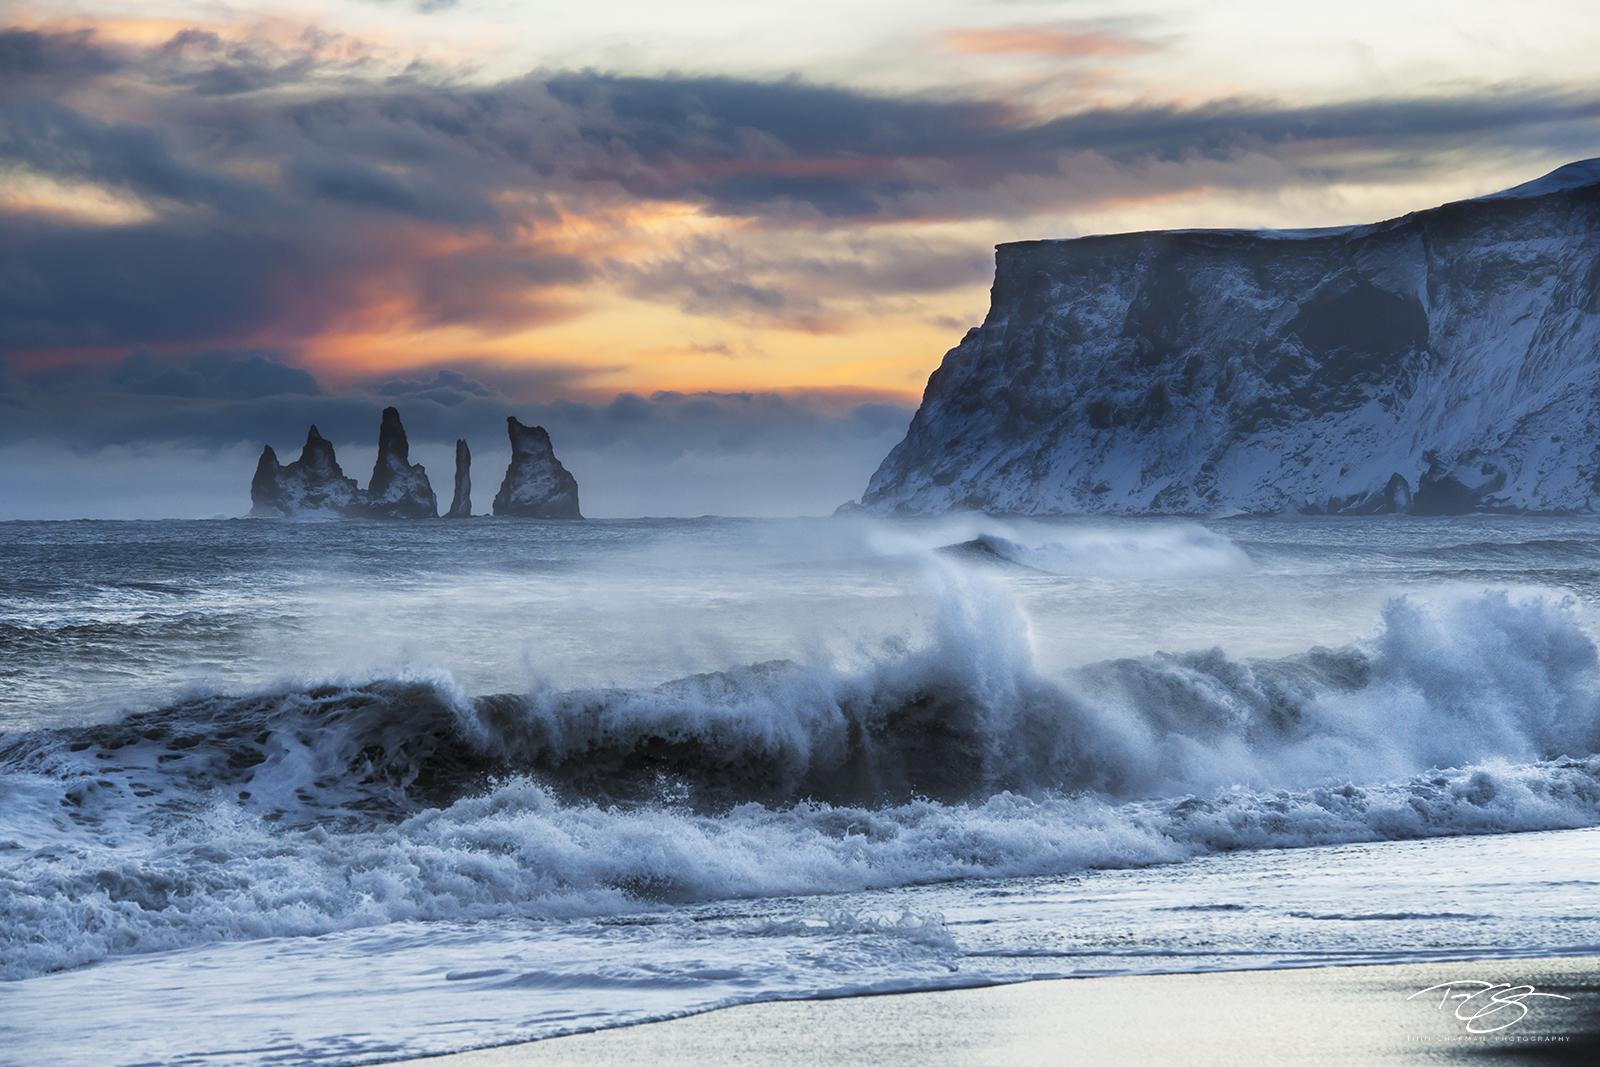 Iceland, reynisdrangar, reynisfragar, vik, troll, trolls, south coast, stormy, waves, crashing, angry, sea, rugged cliffs, sunset, the secret life of walter mitty, game of thrones, photo